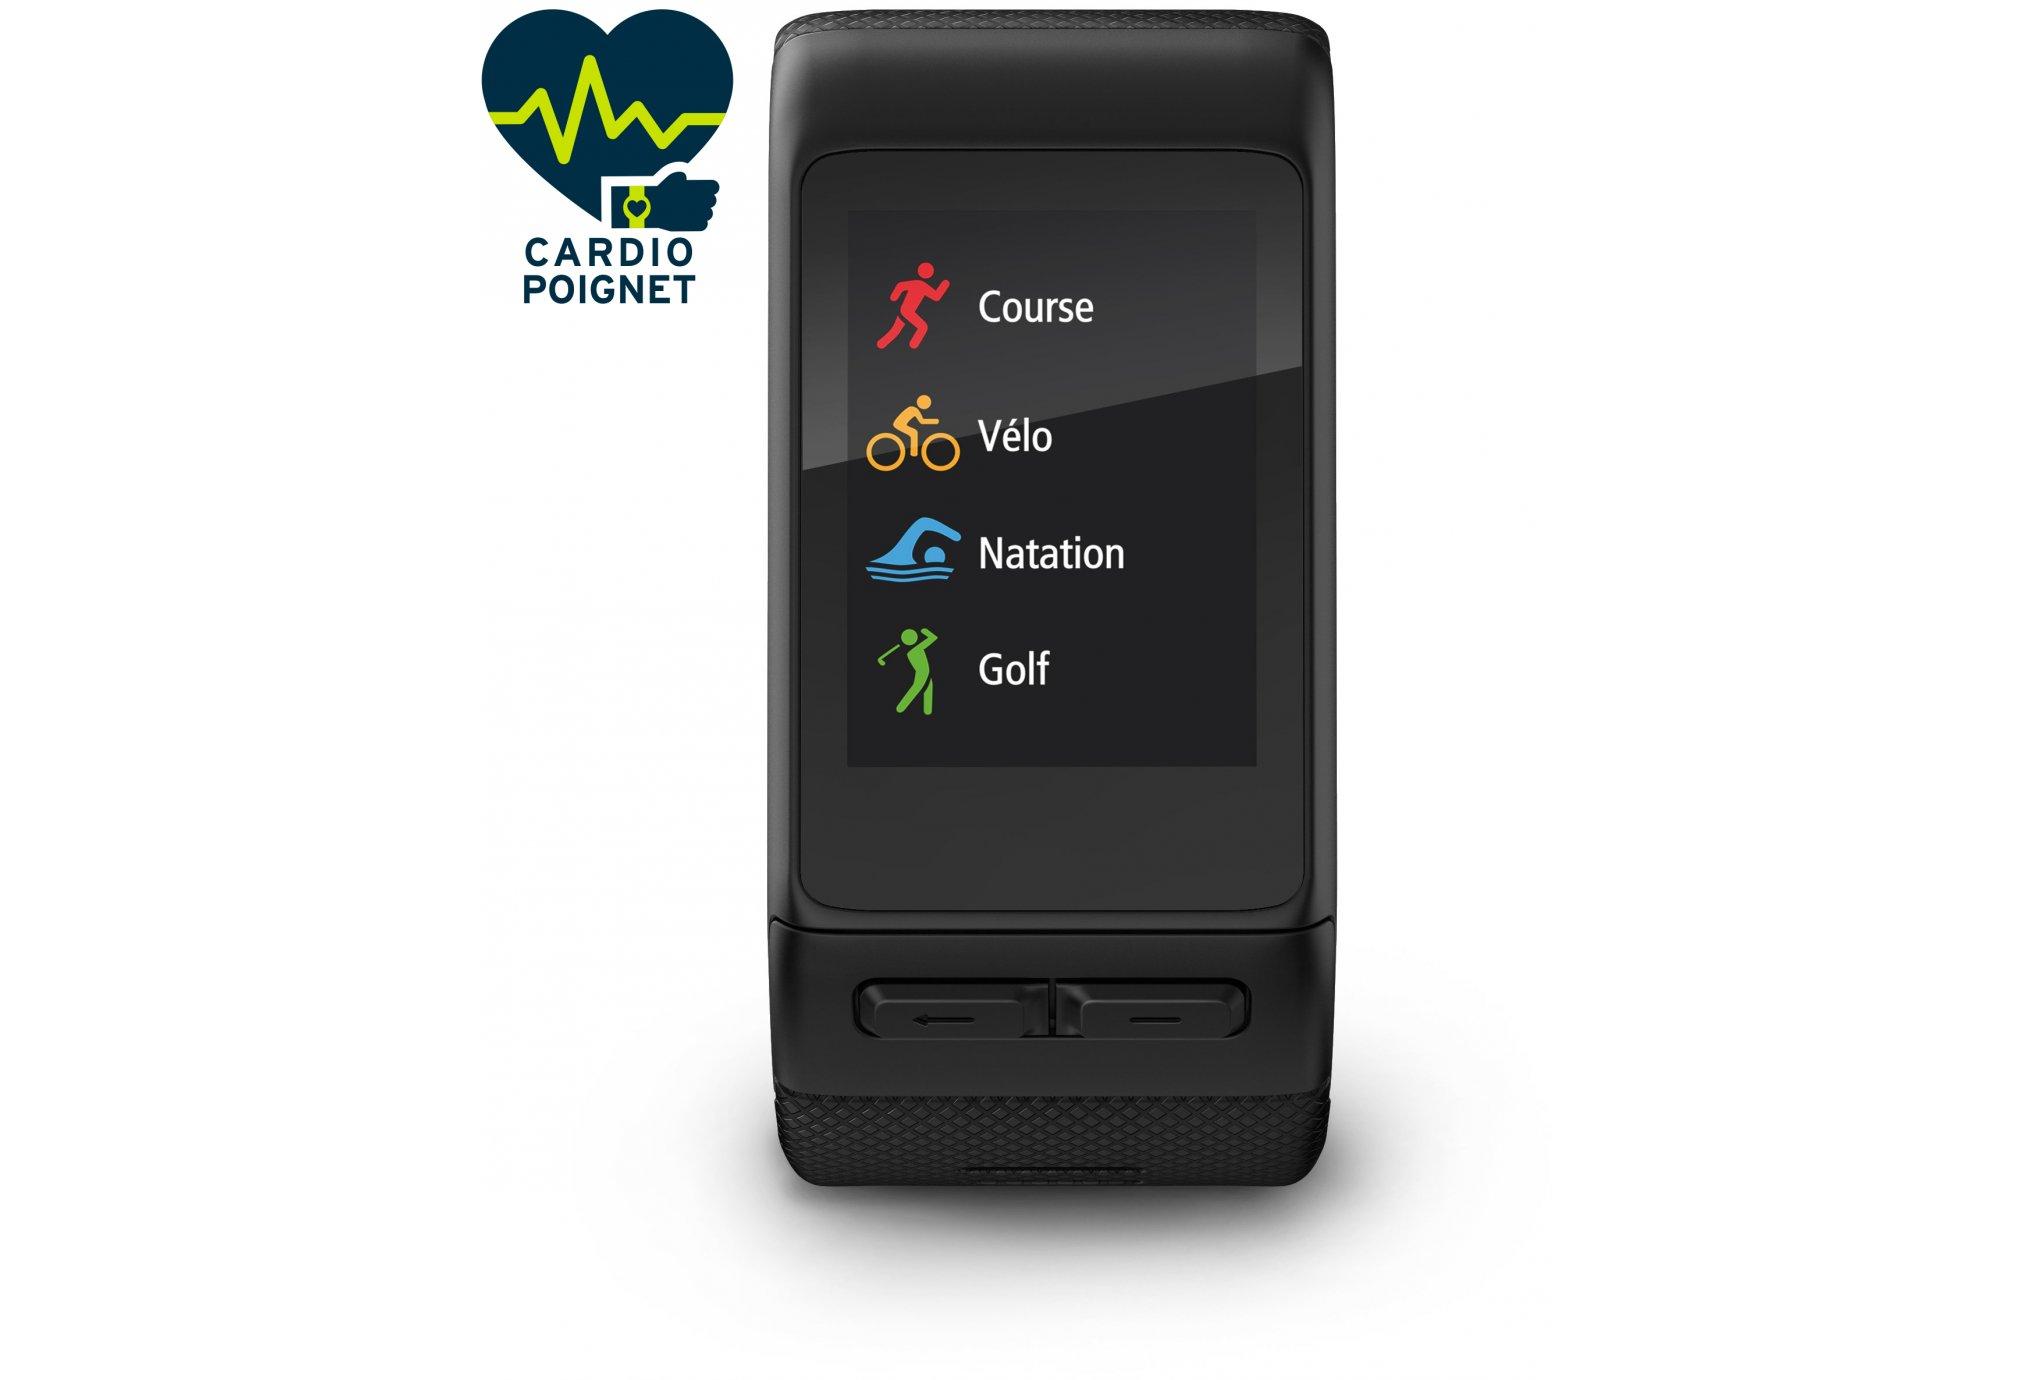 Garmin Vivoactive HR - Standard Cardio-Gps